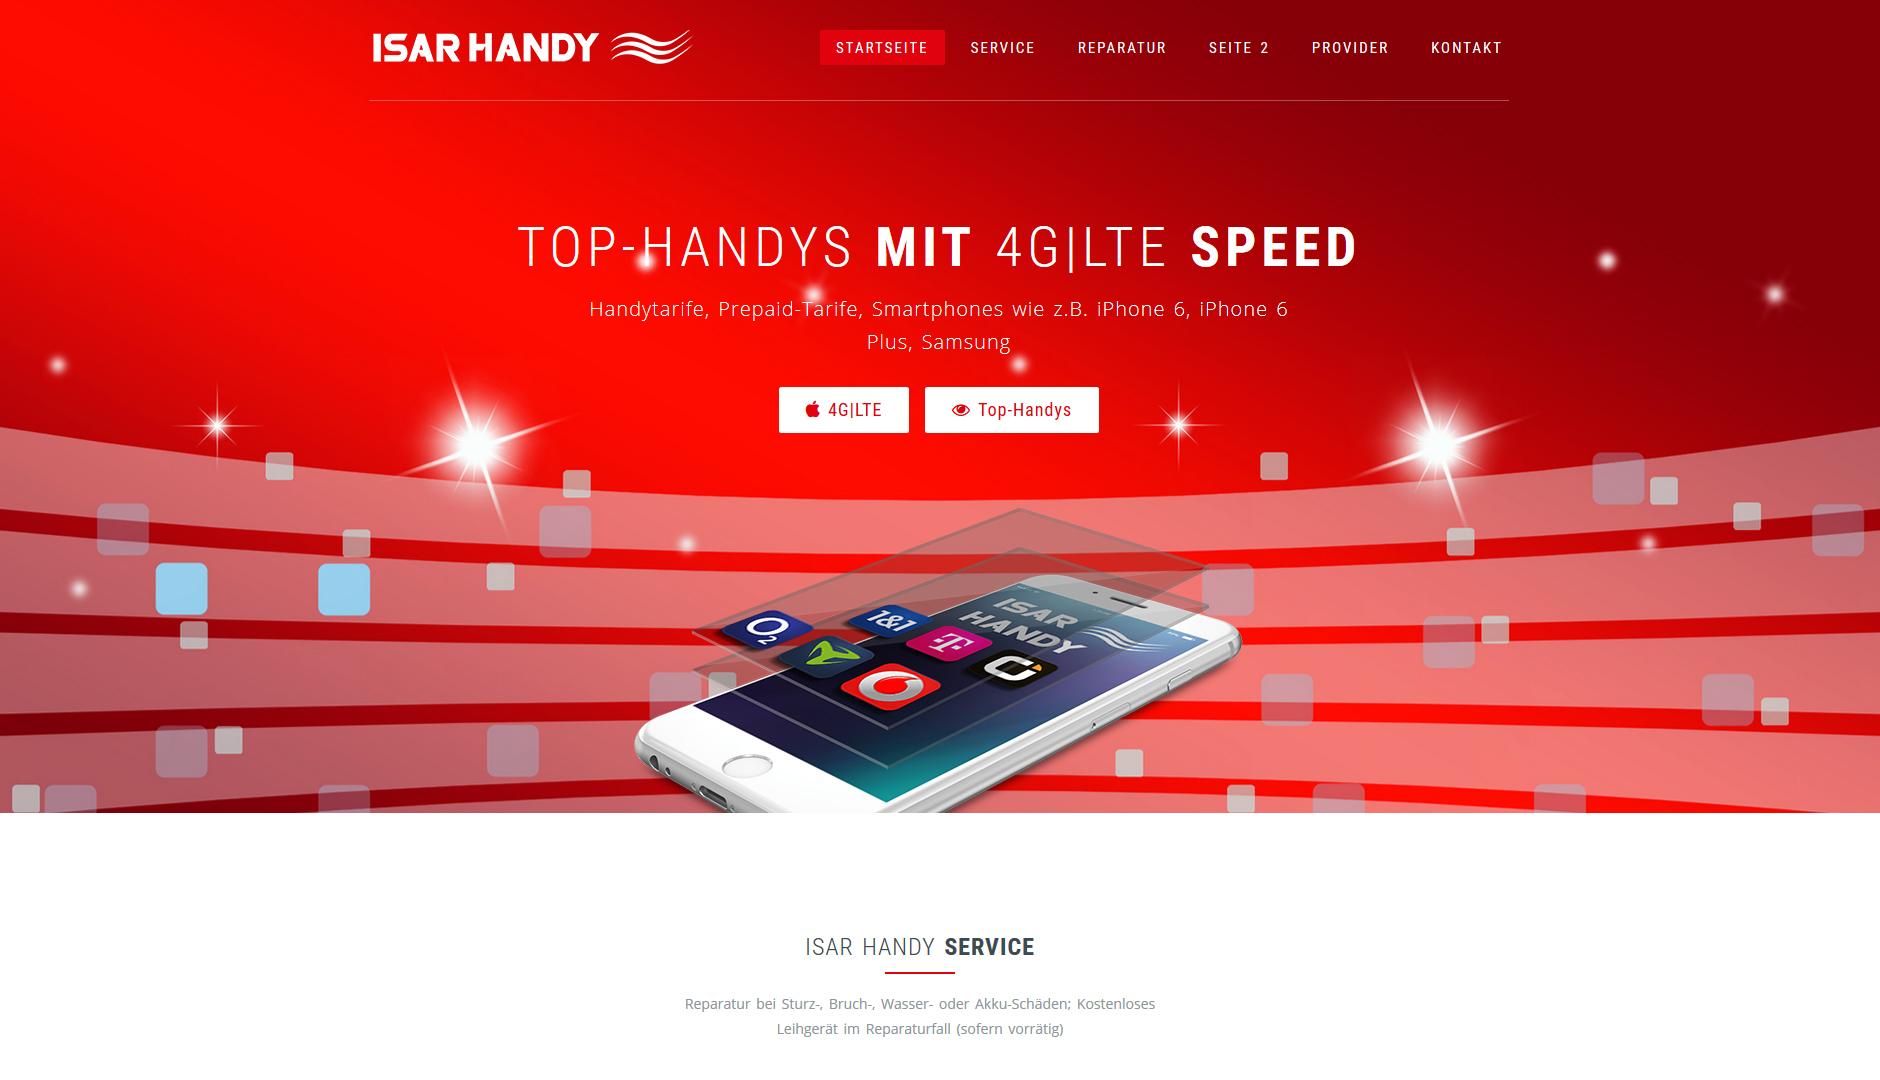 Isar-Handy Geretsried v2